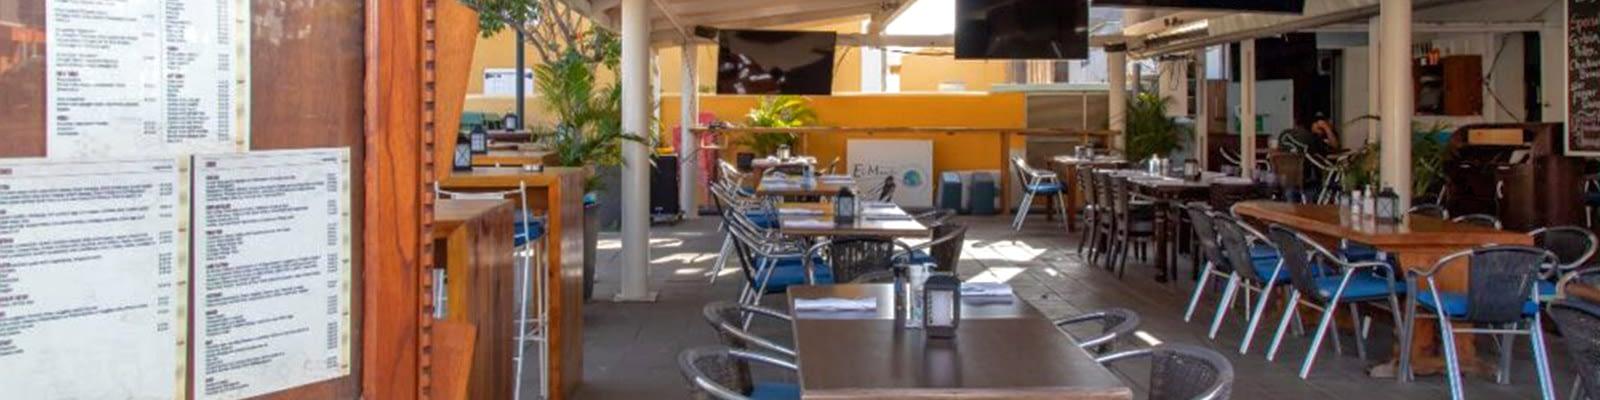 el-mundo-restaurant-bonaire-slider-7